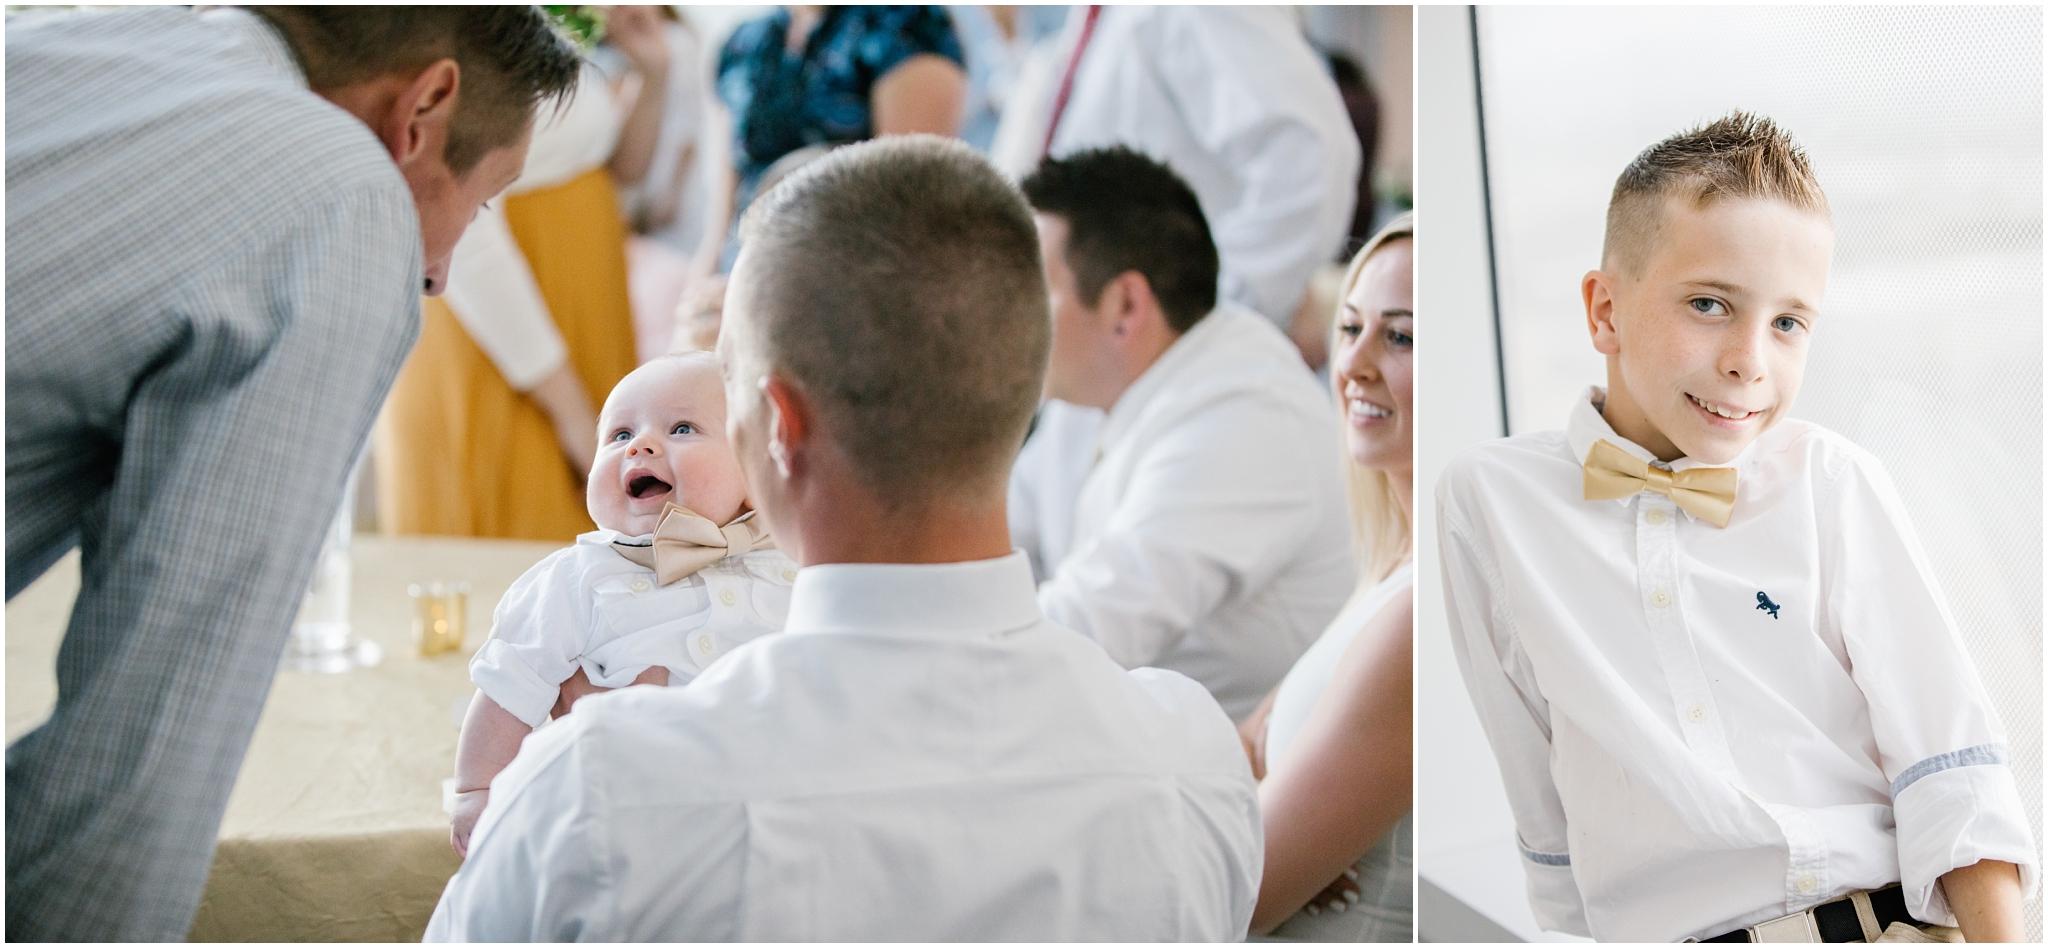 CherylandTyler-429_Lizzie-B-Imagery-Utah-Wedding-Photographer-Salt-Lake-City-Temple-Wells-Fargo-Building-Reception.jpg